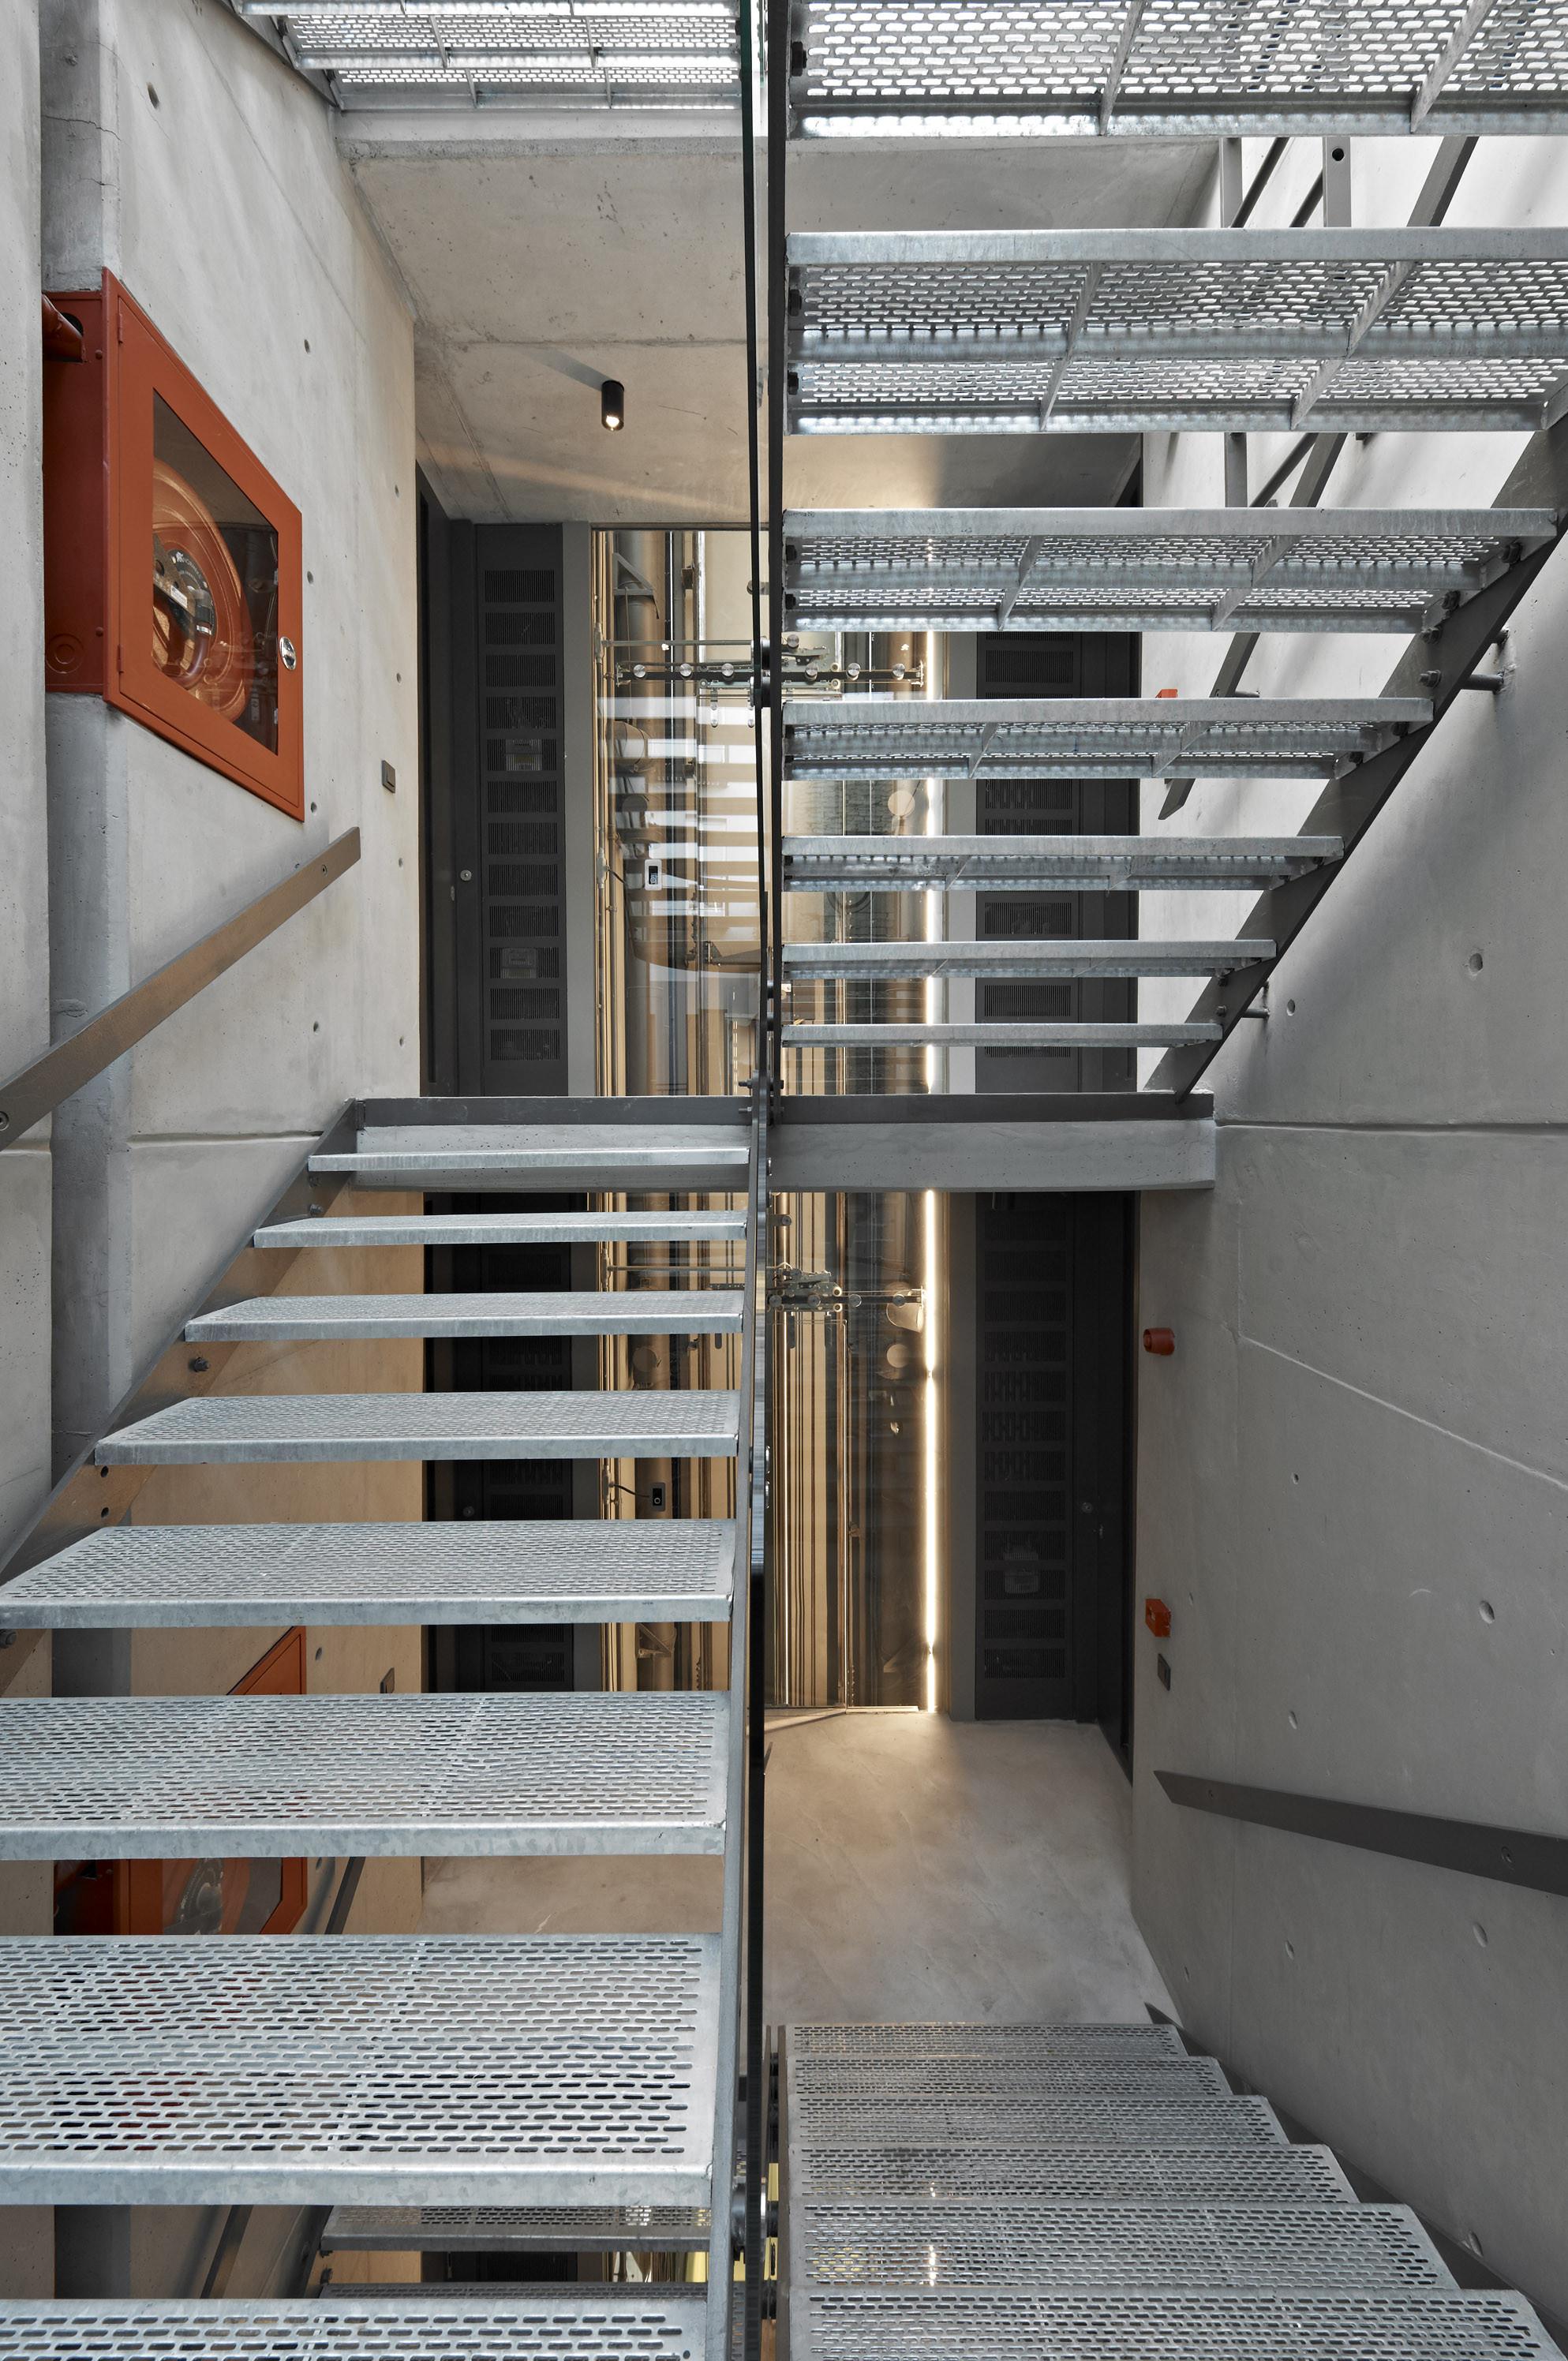 gallery of pera 25 alata architecture consulting 17. Black Bedroom Furniture Sets. Home Design Ideas